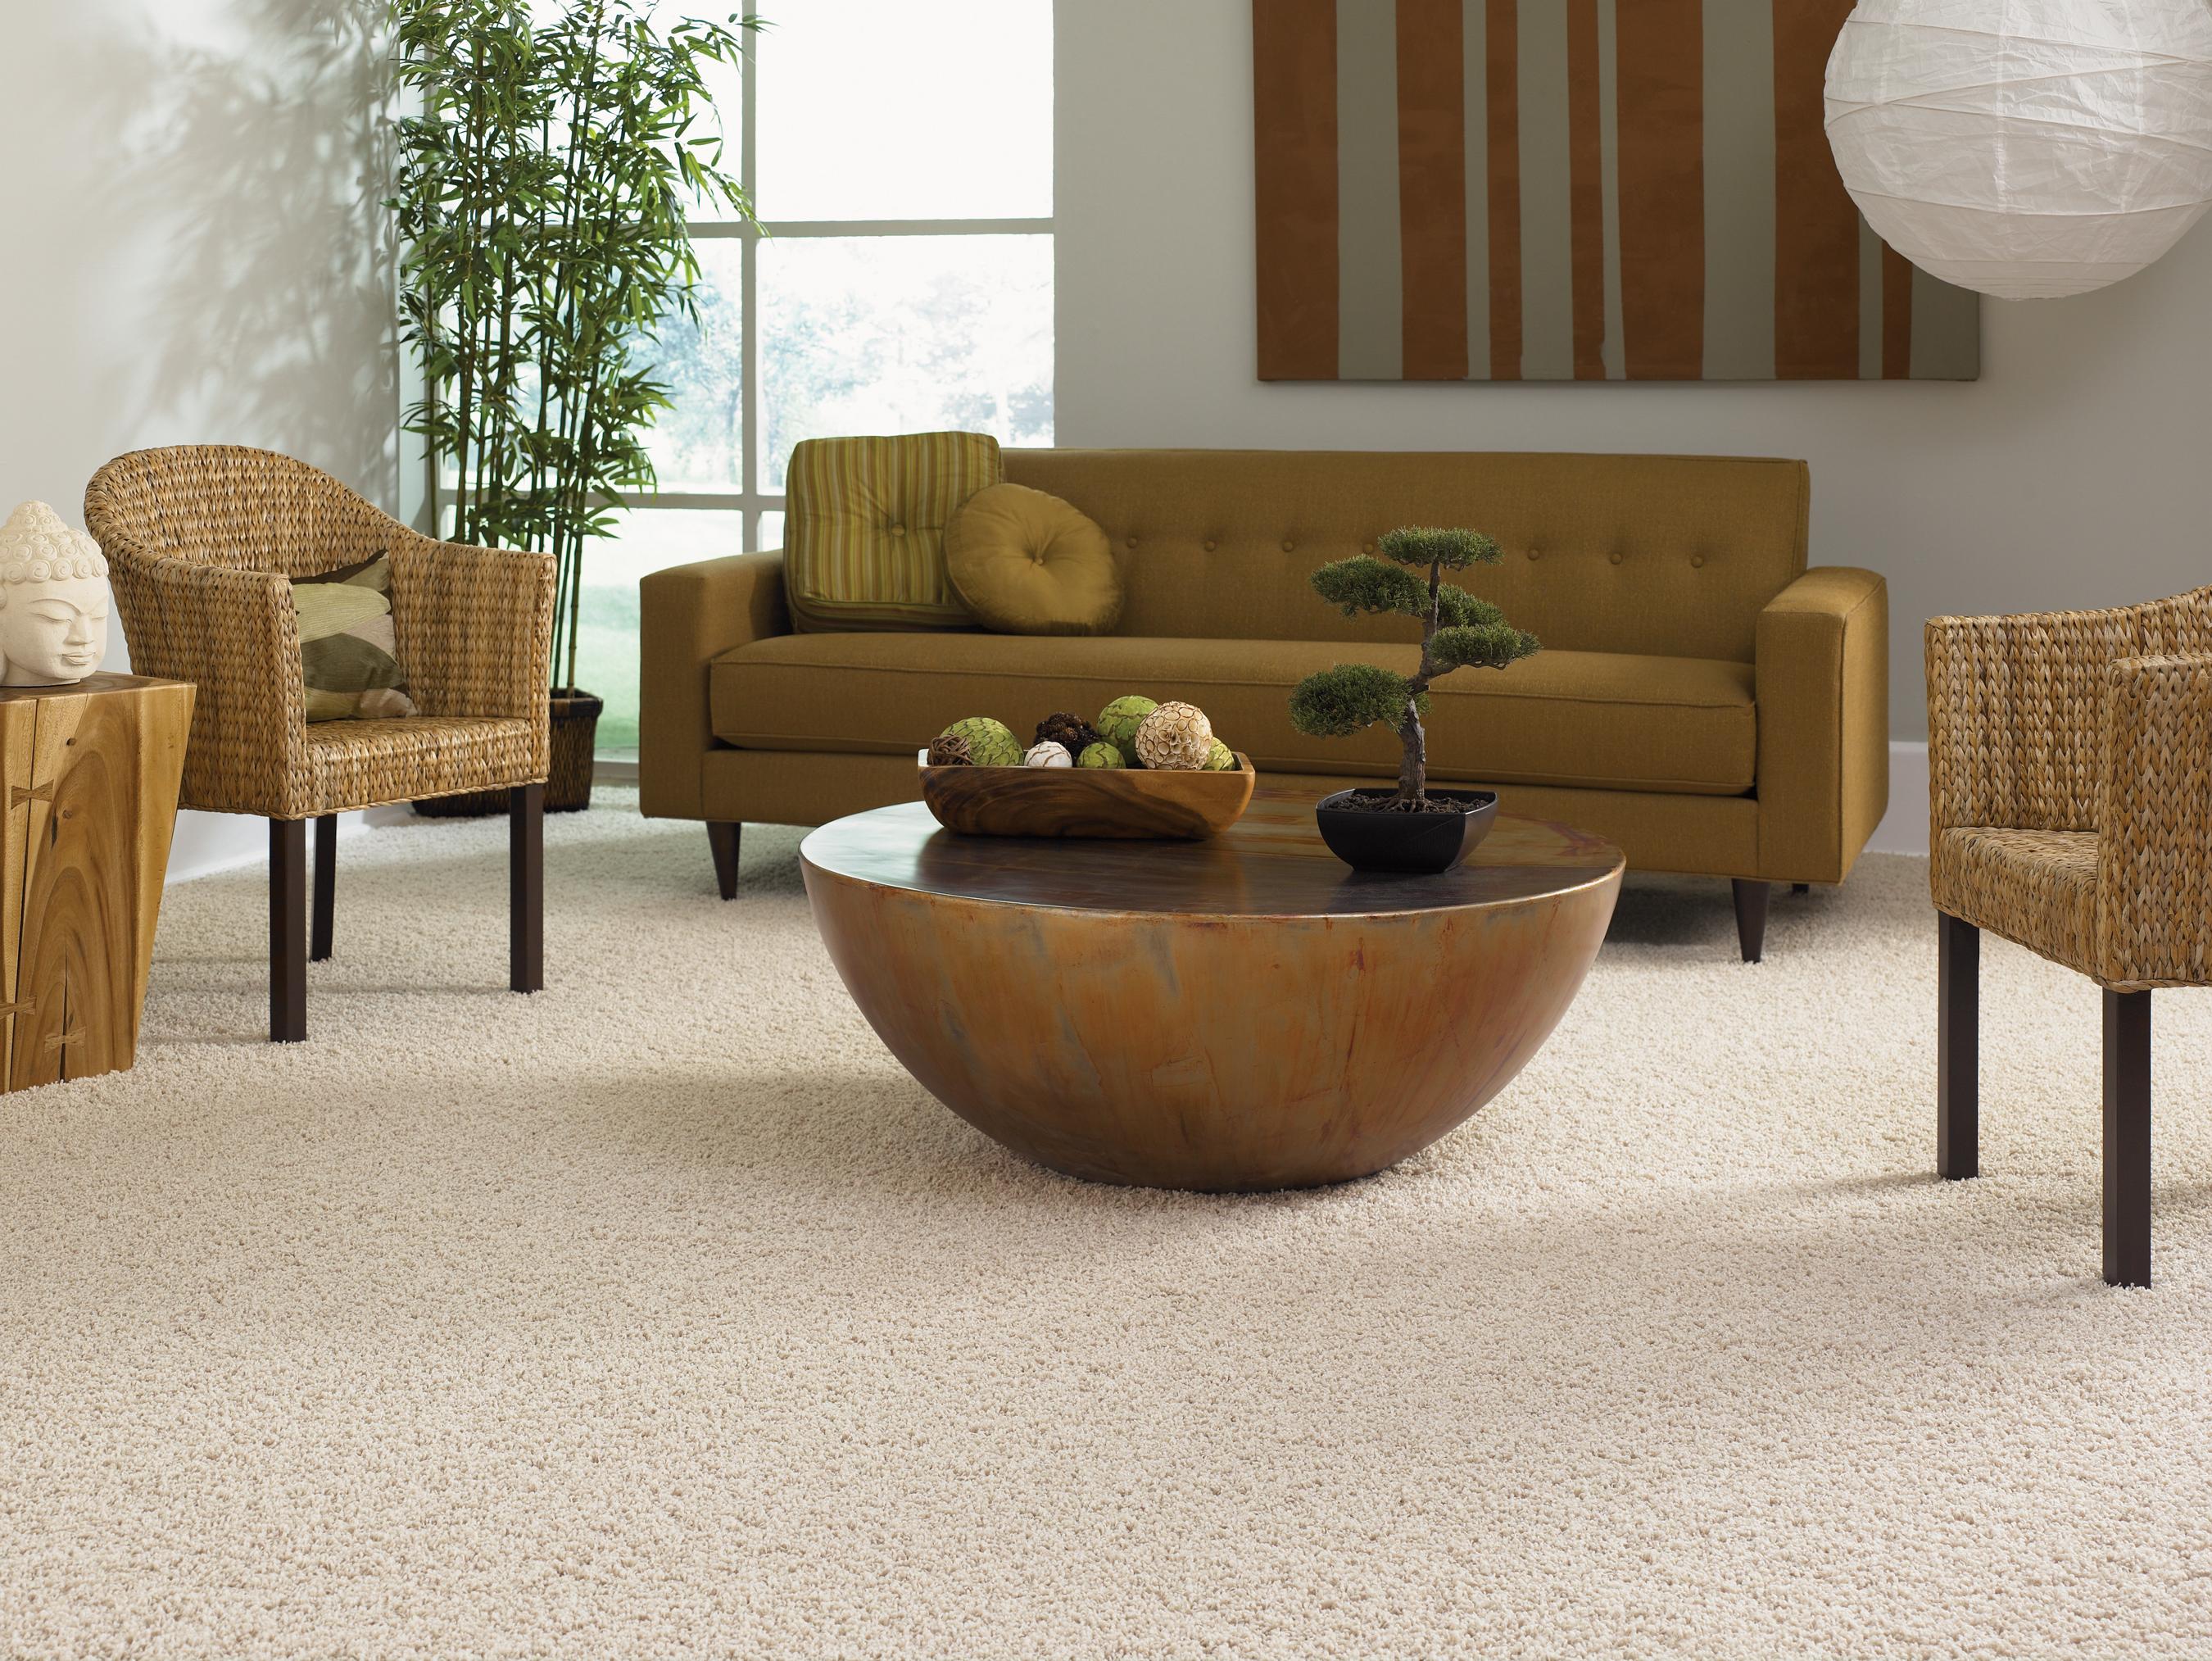 carpet-cleaning-service-basingstoke